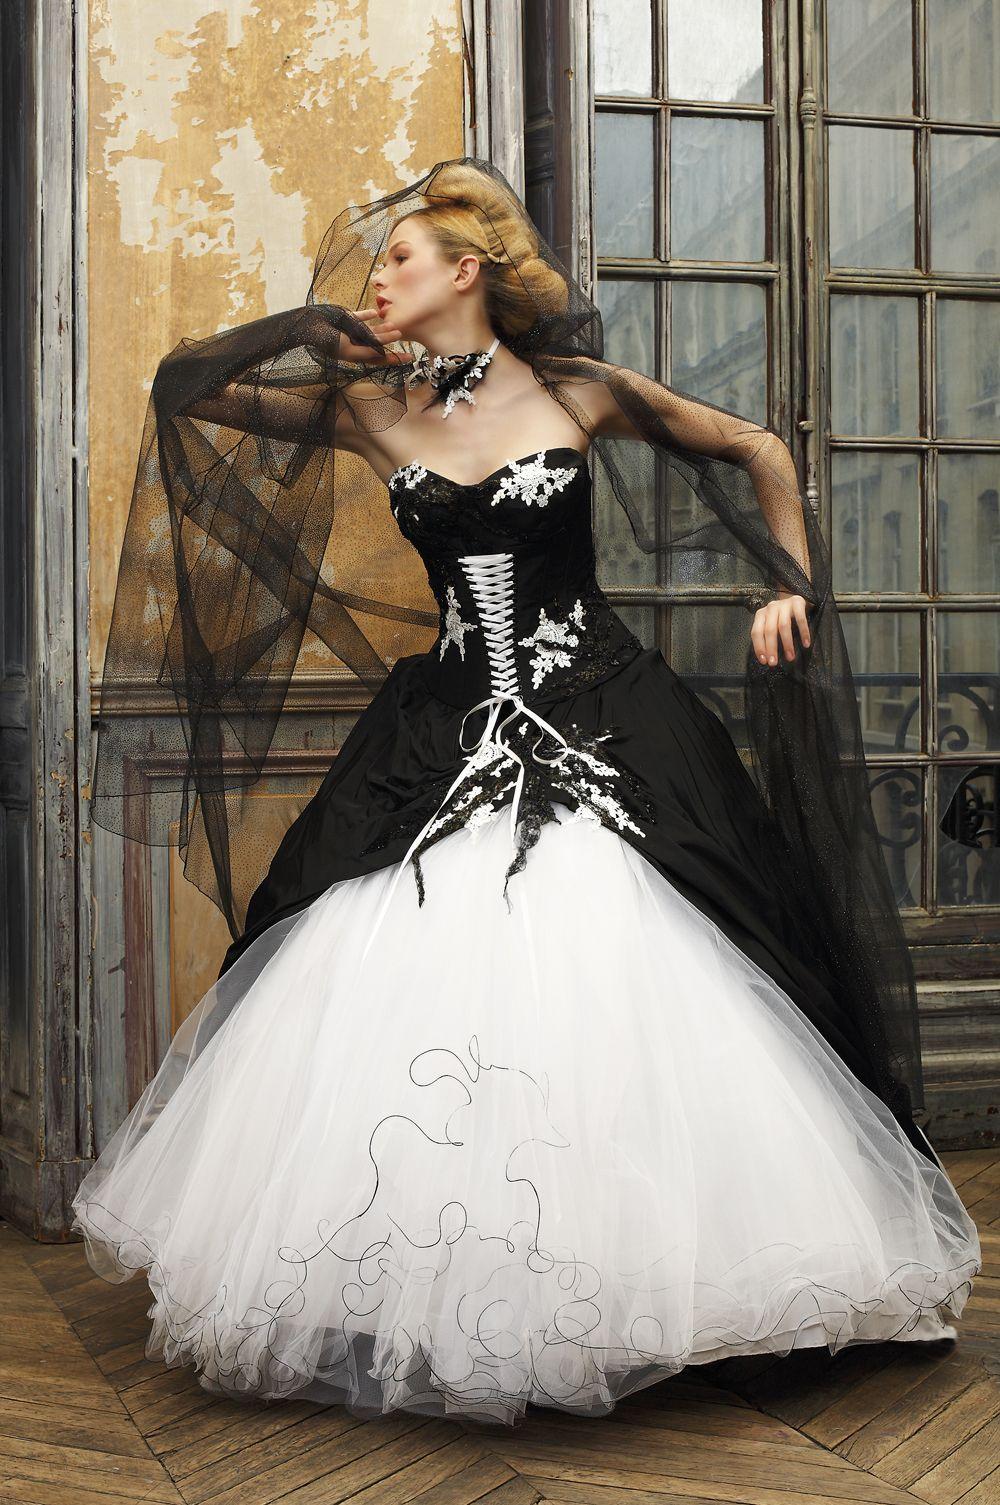 wedding dresses black black wedding dresses eli shay wedding dress collections u jewelry white black u corset and taffeta skirt trimmed